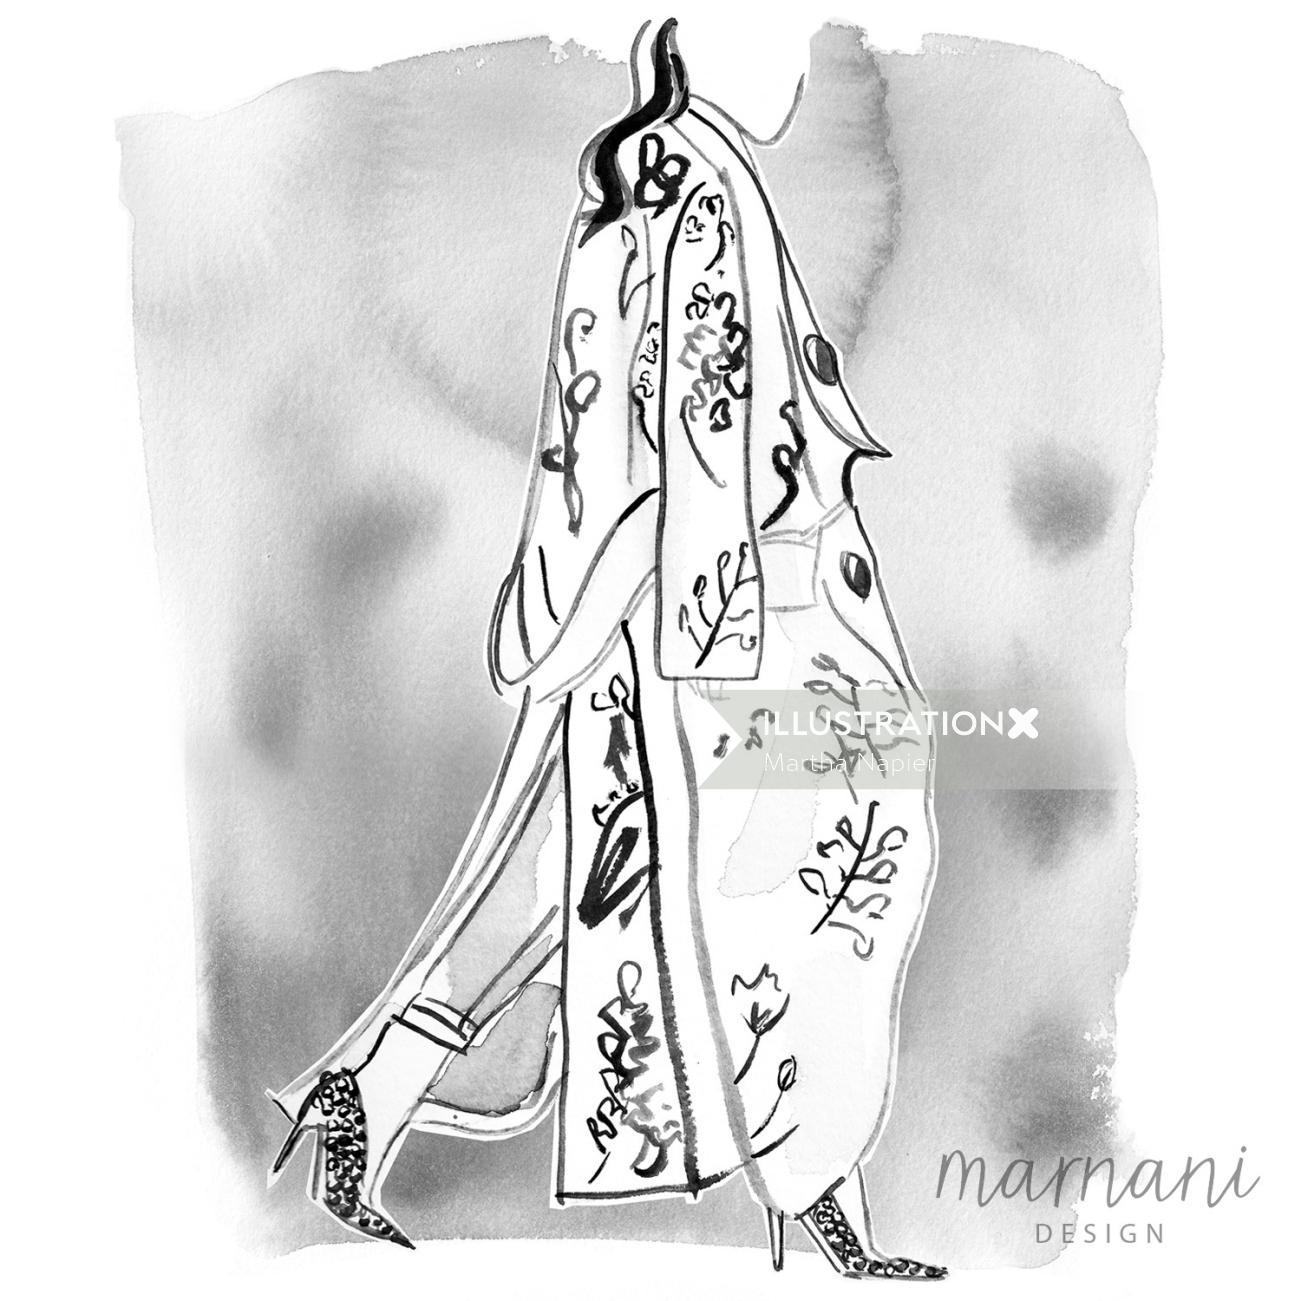 Black & white illustration of a fabulous floral coat